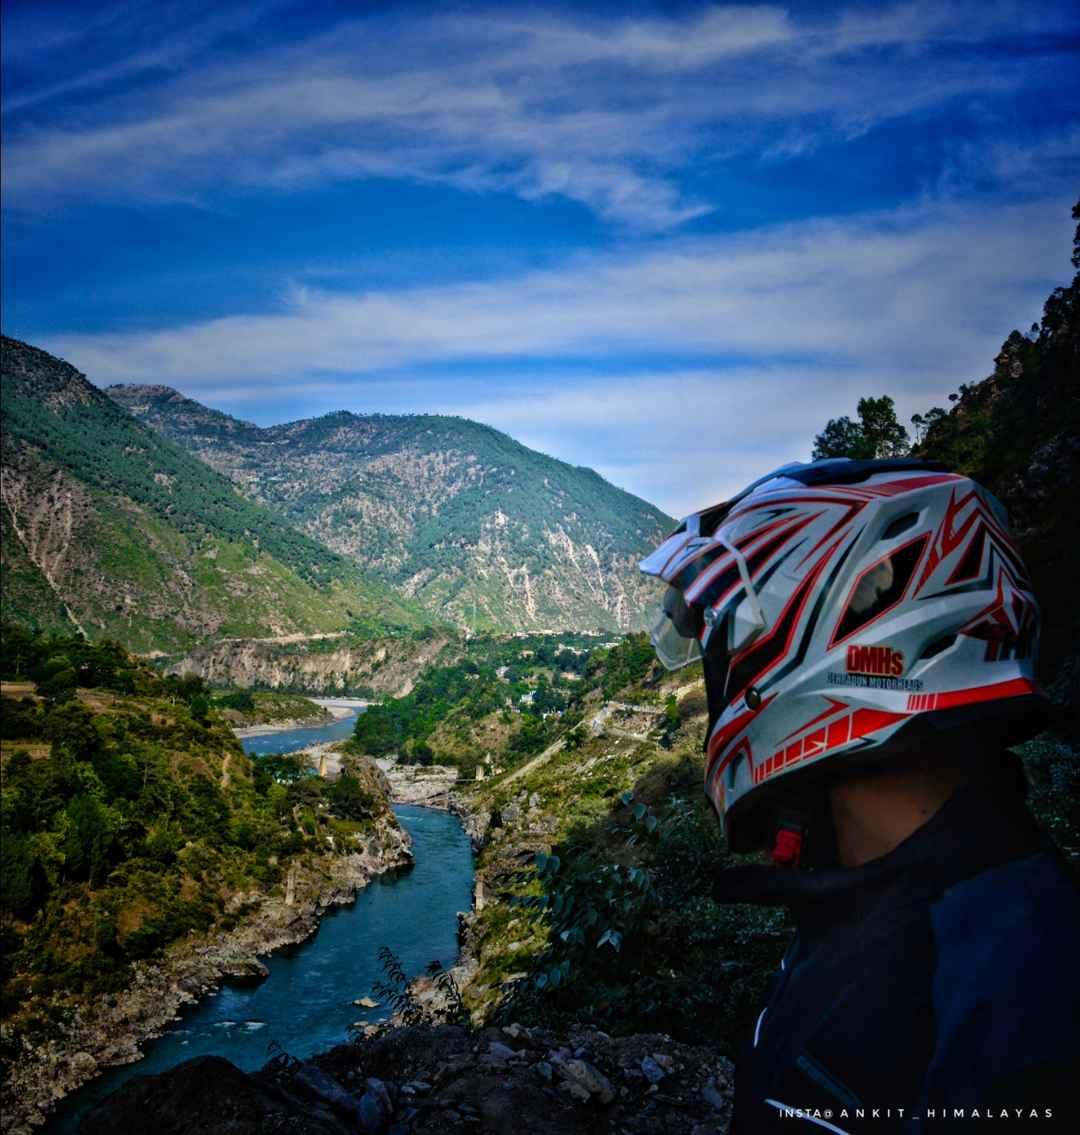 Niti Village In Uttarakhand Itinerary: How To Reach